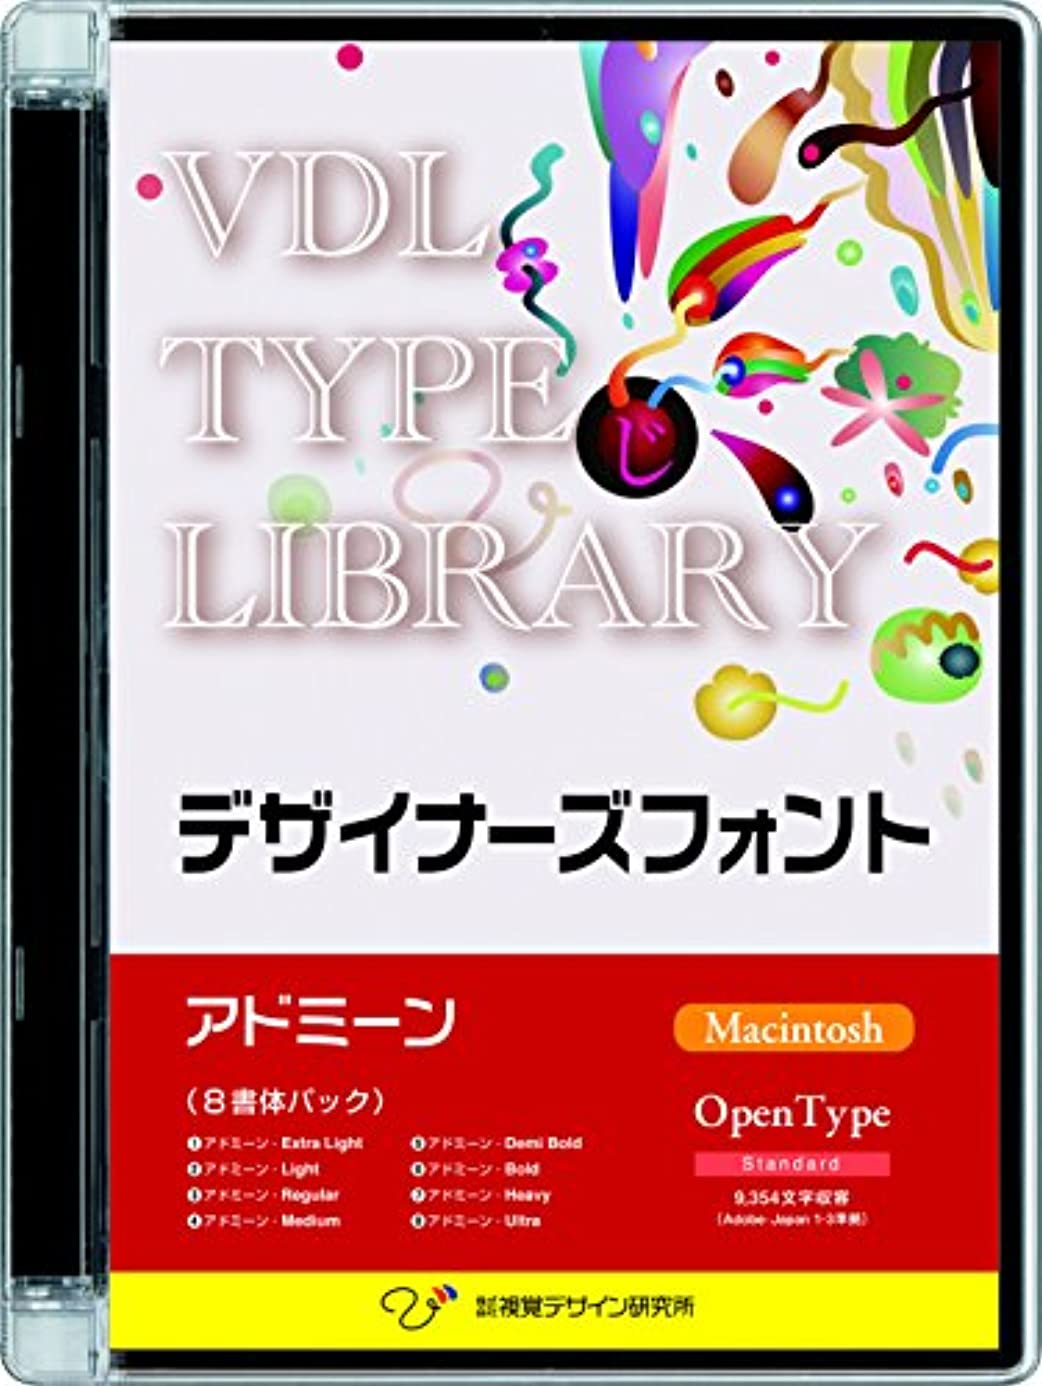 VDL TYPE LIBRARY デザイナーズフォント OpenType (Standard) Macintosh アドミーン ファミリーパック